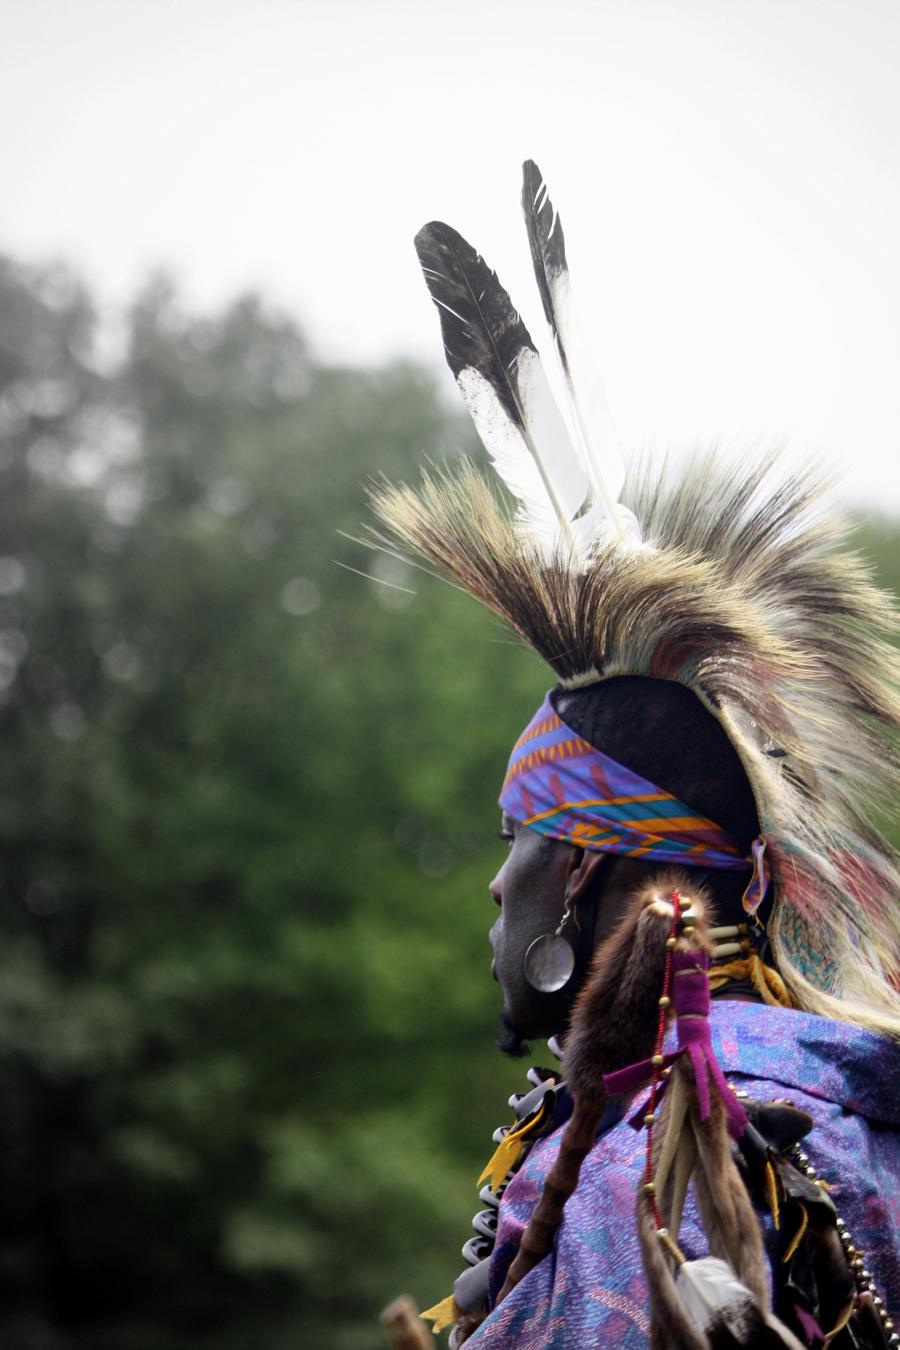 warrior native plain american - photo #26